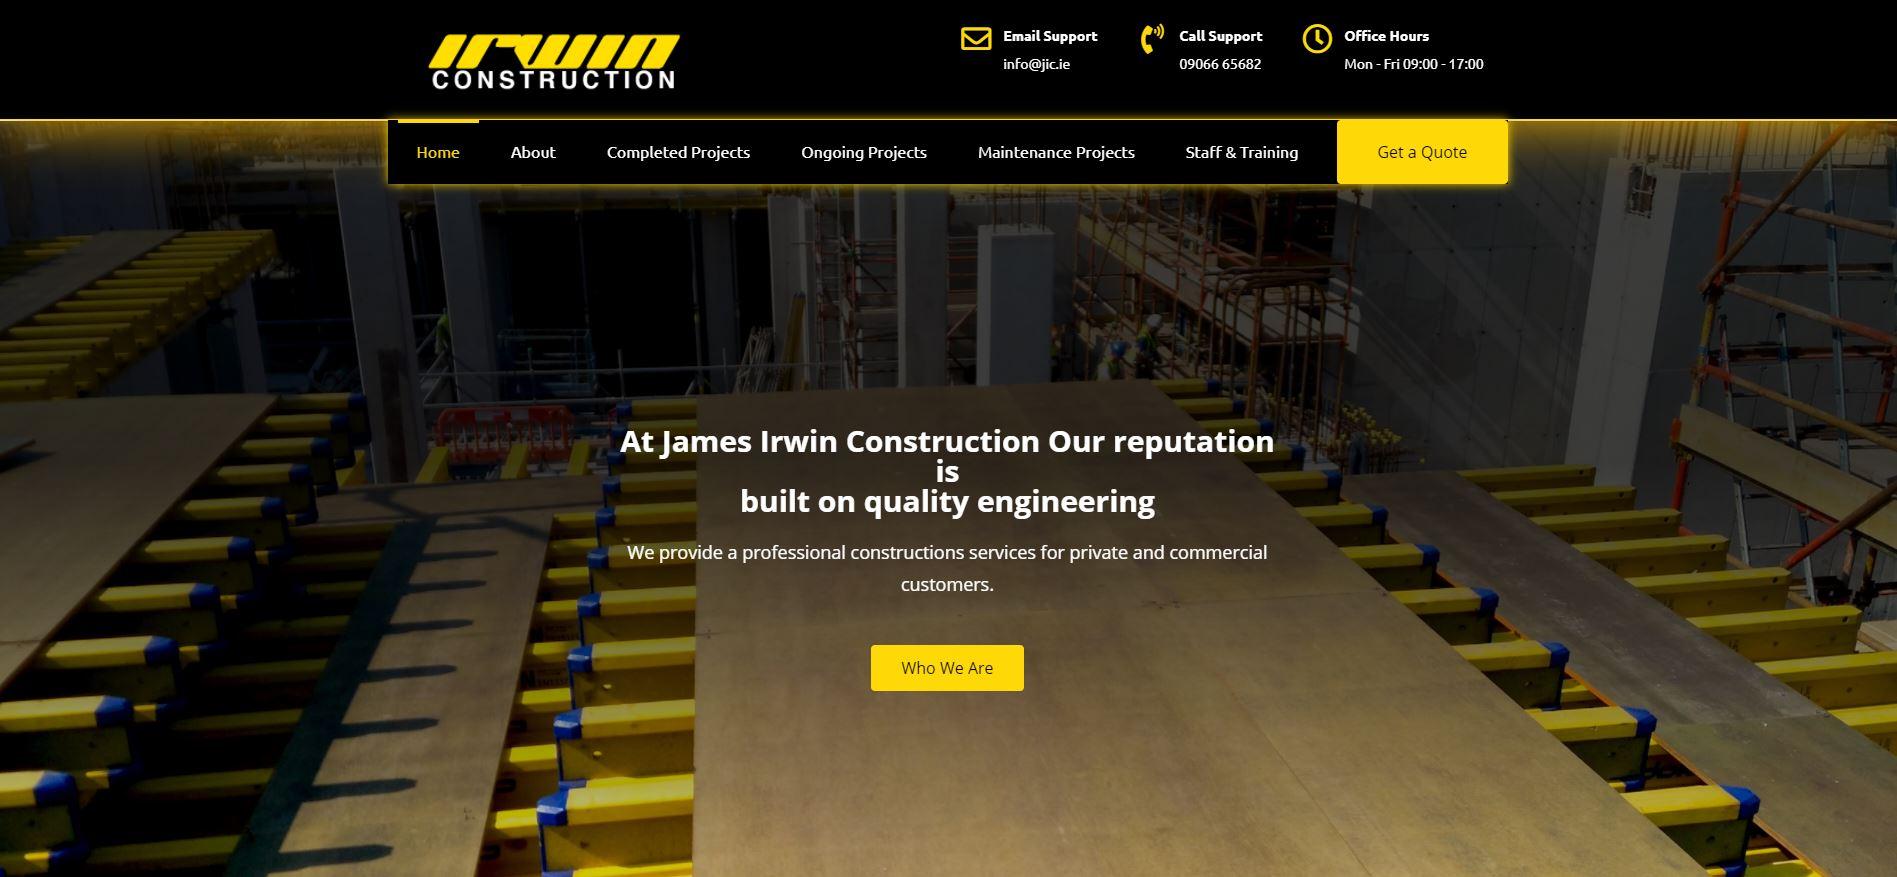 James Irwin Construction